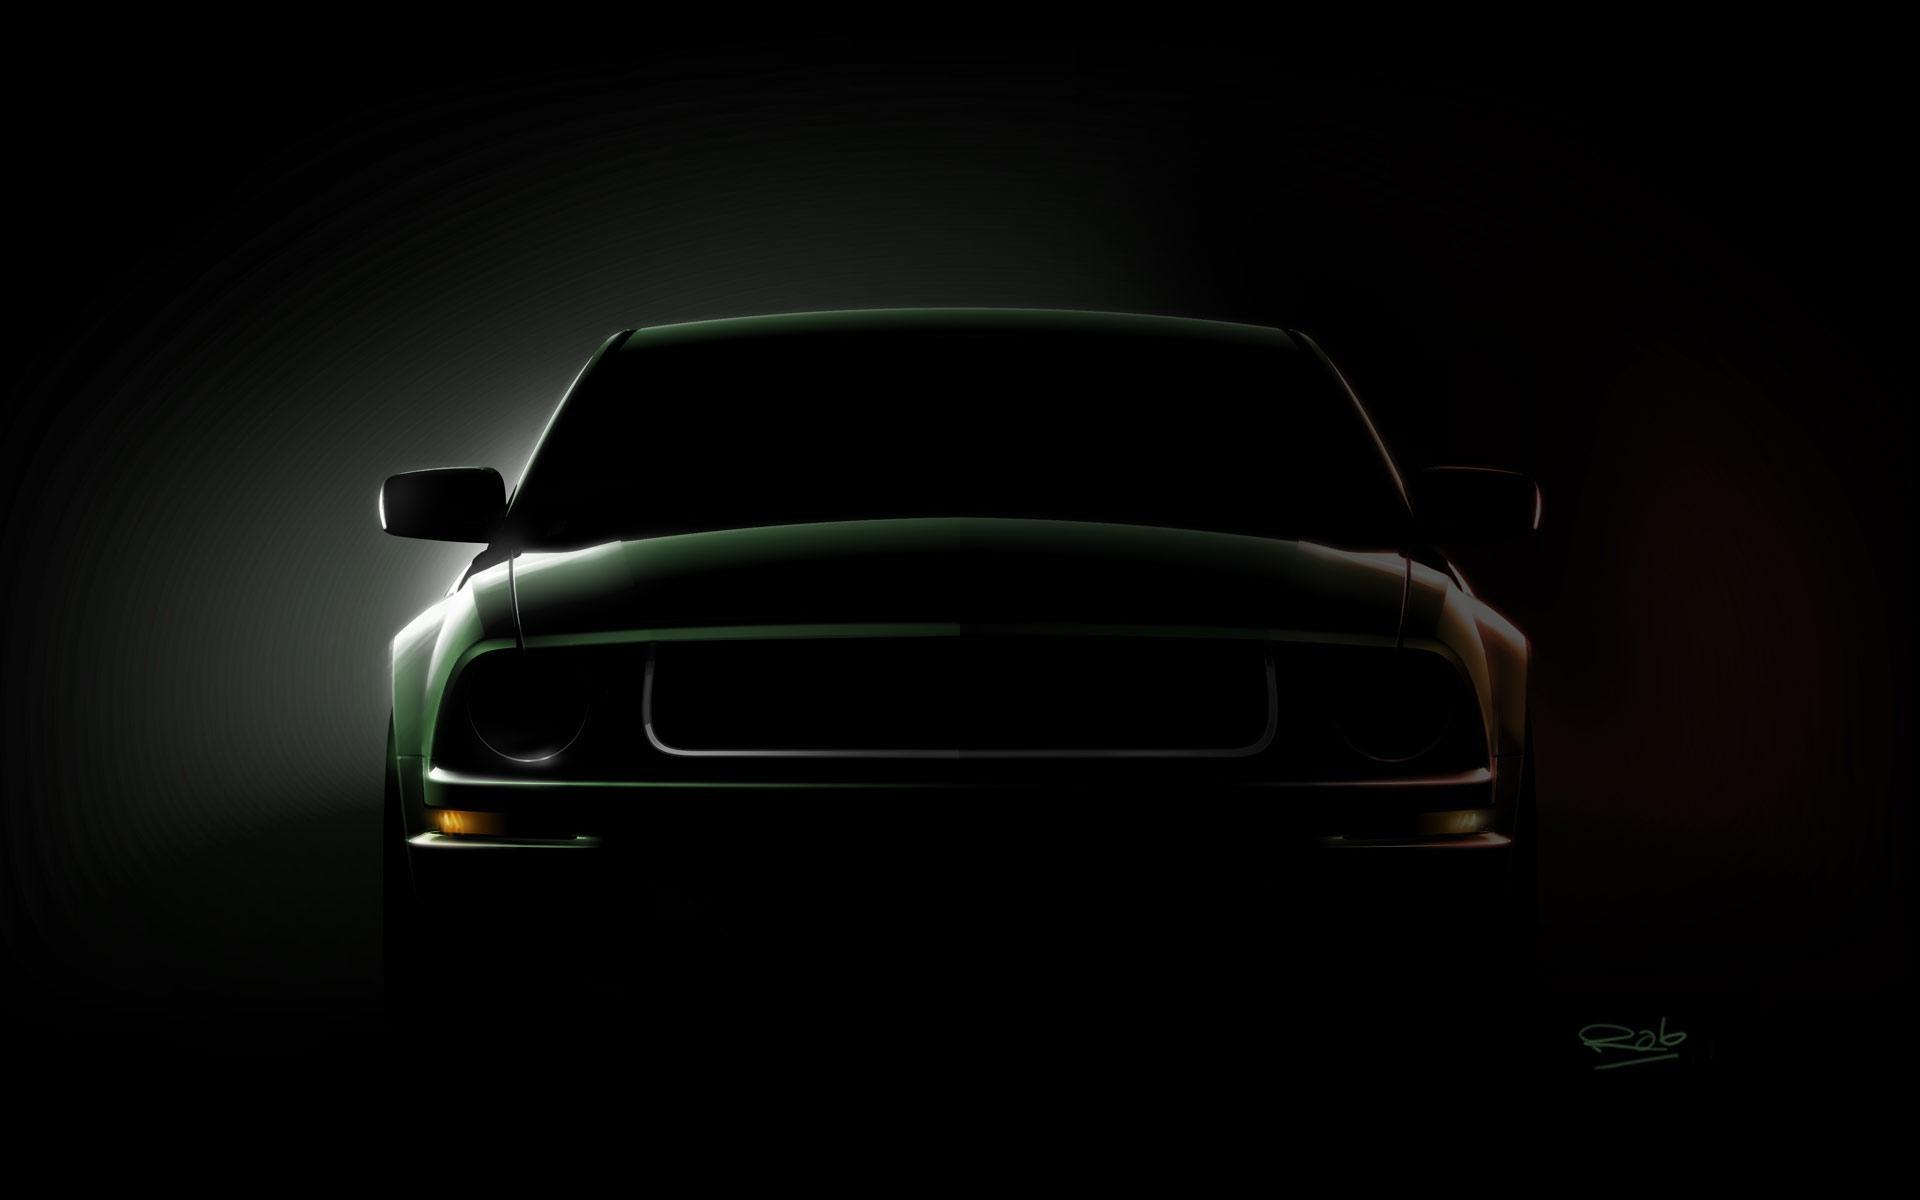 Mustang Cobra Wallpapers 72 Images